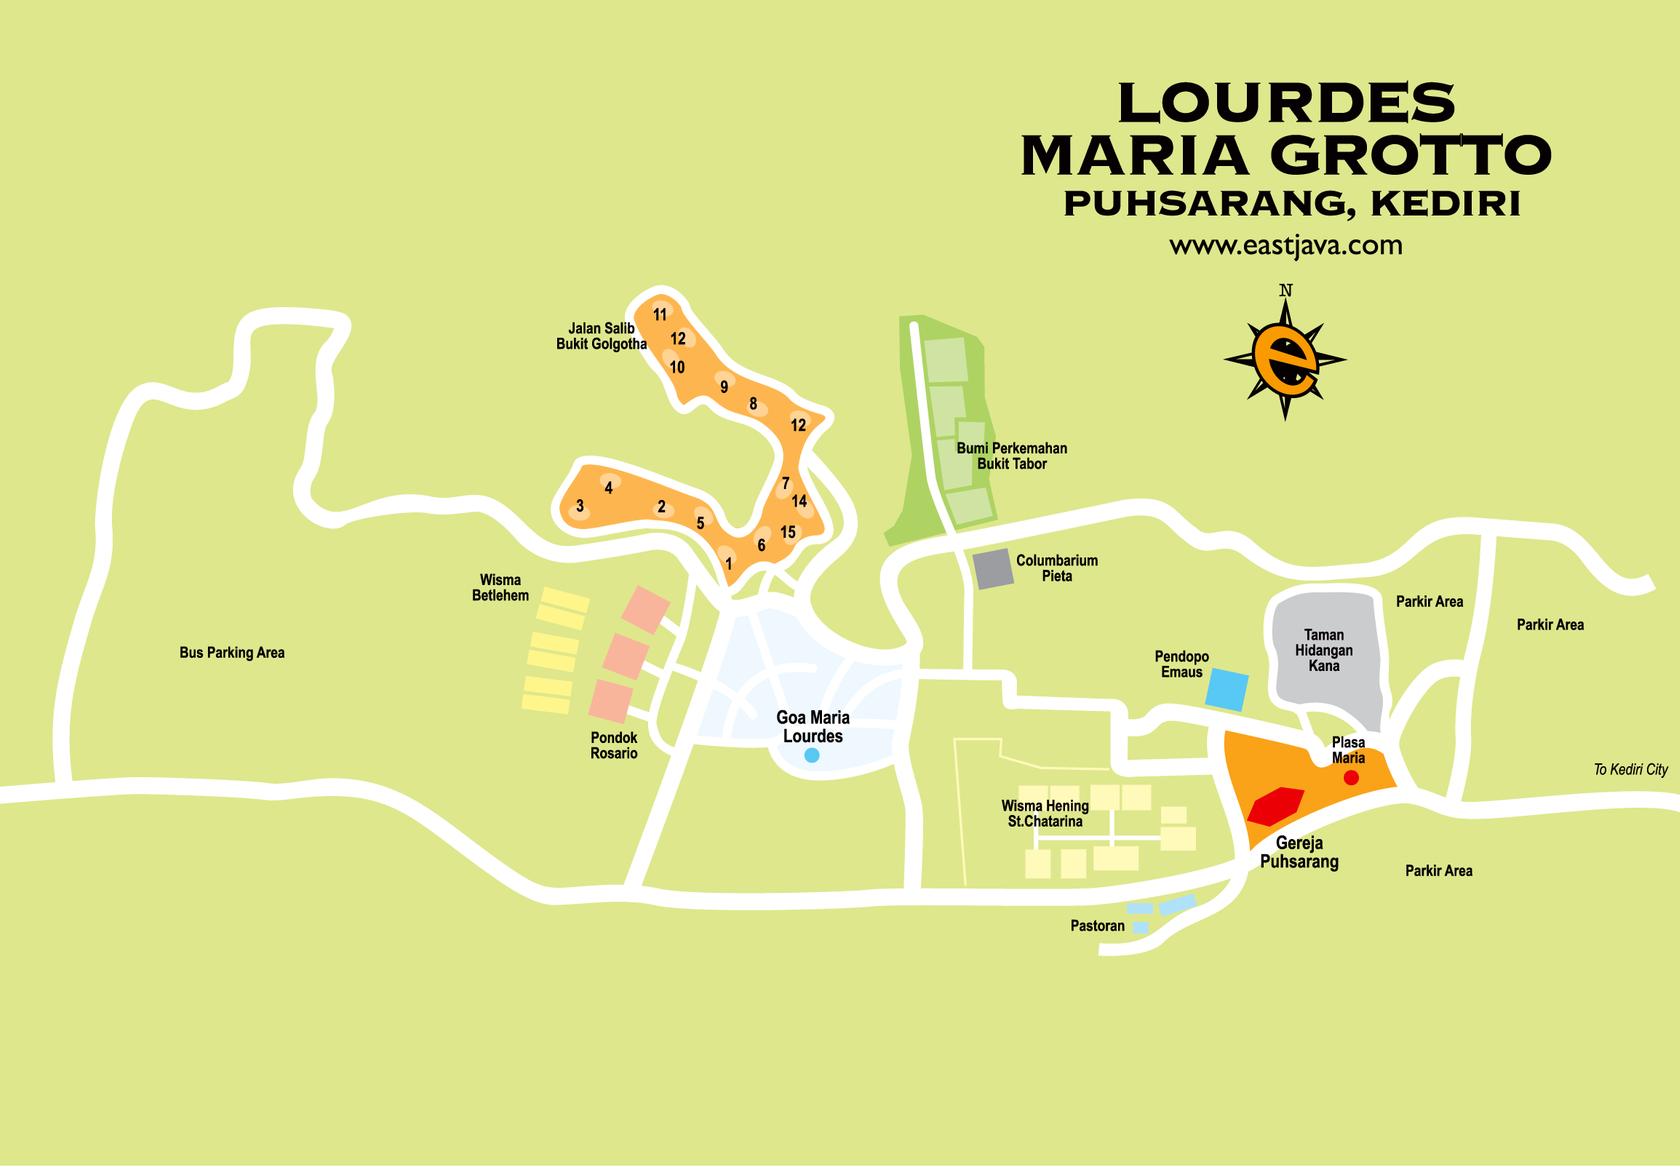 Gereja Pohsarang Gua Maria Lourdes Kediri Jawa Timur Steemit Map